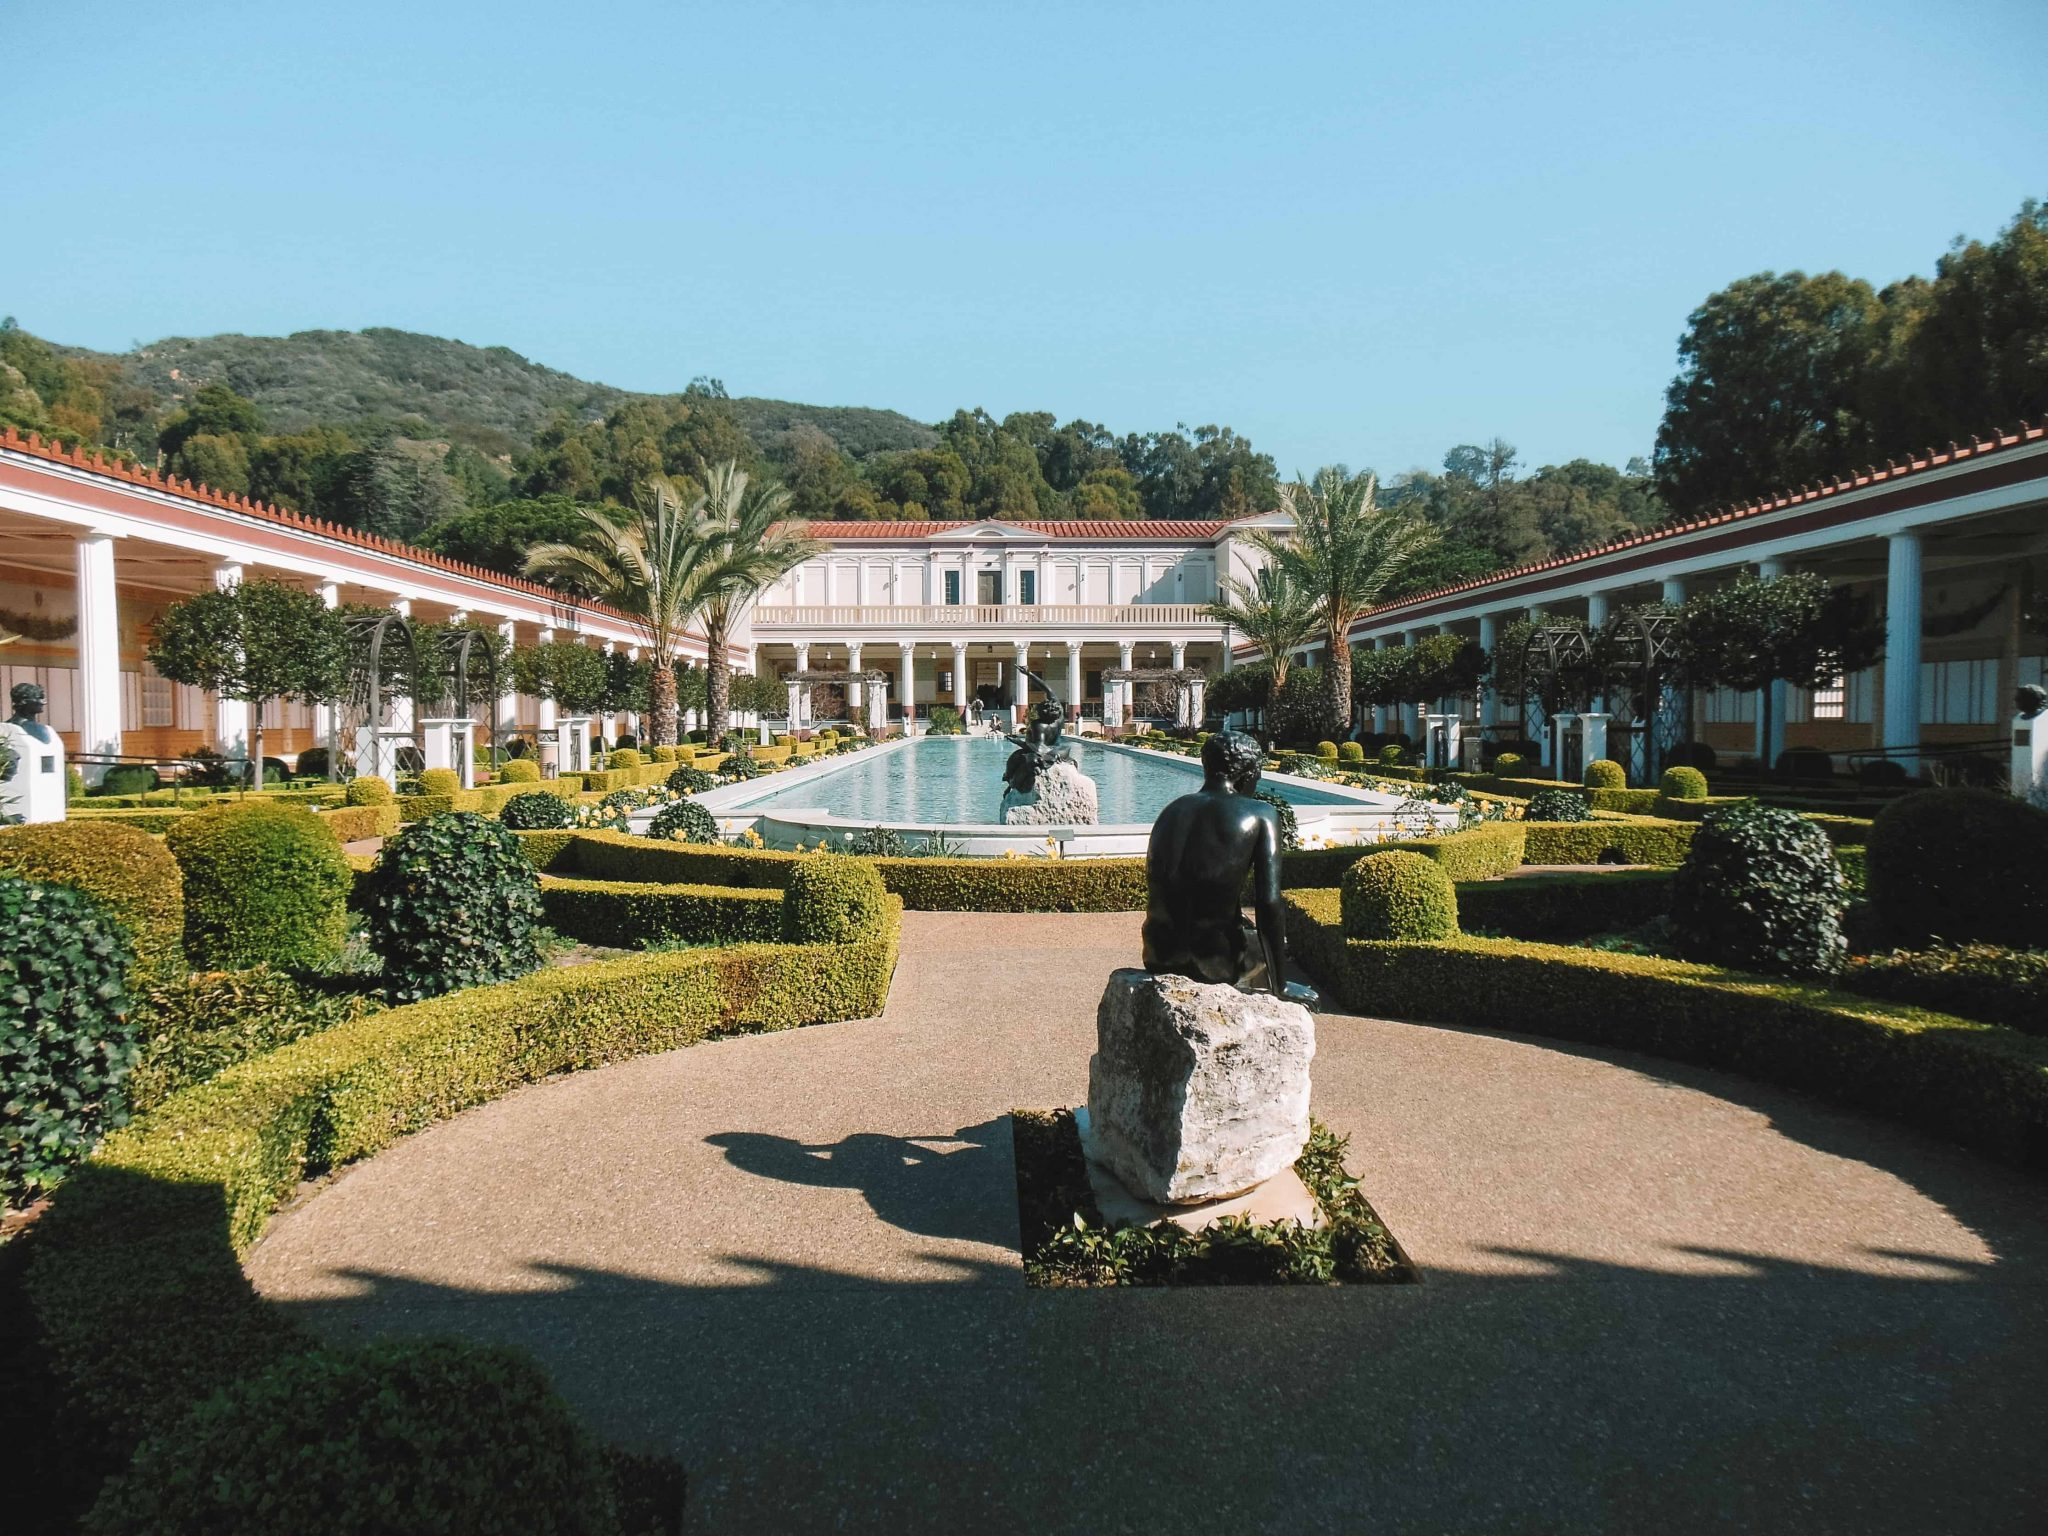 visit the stunning getty villa